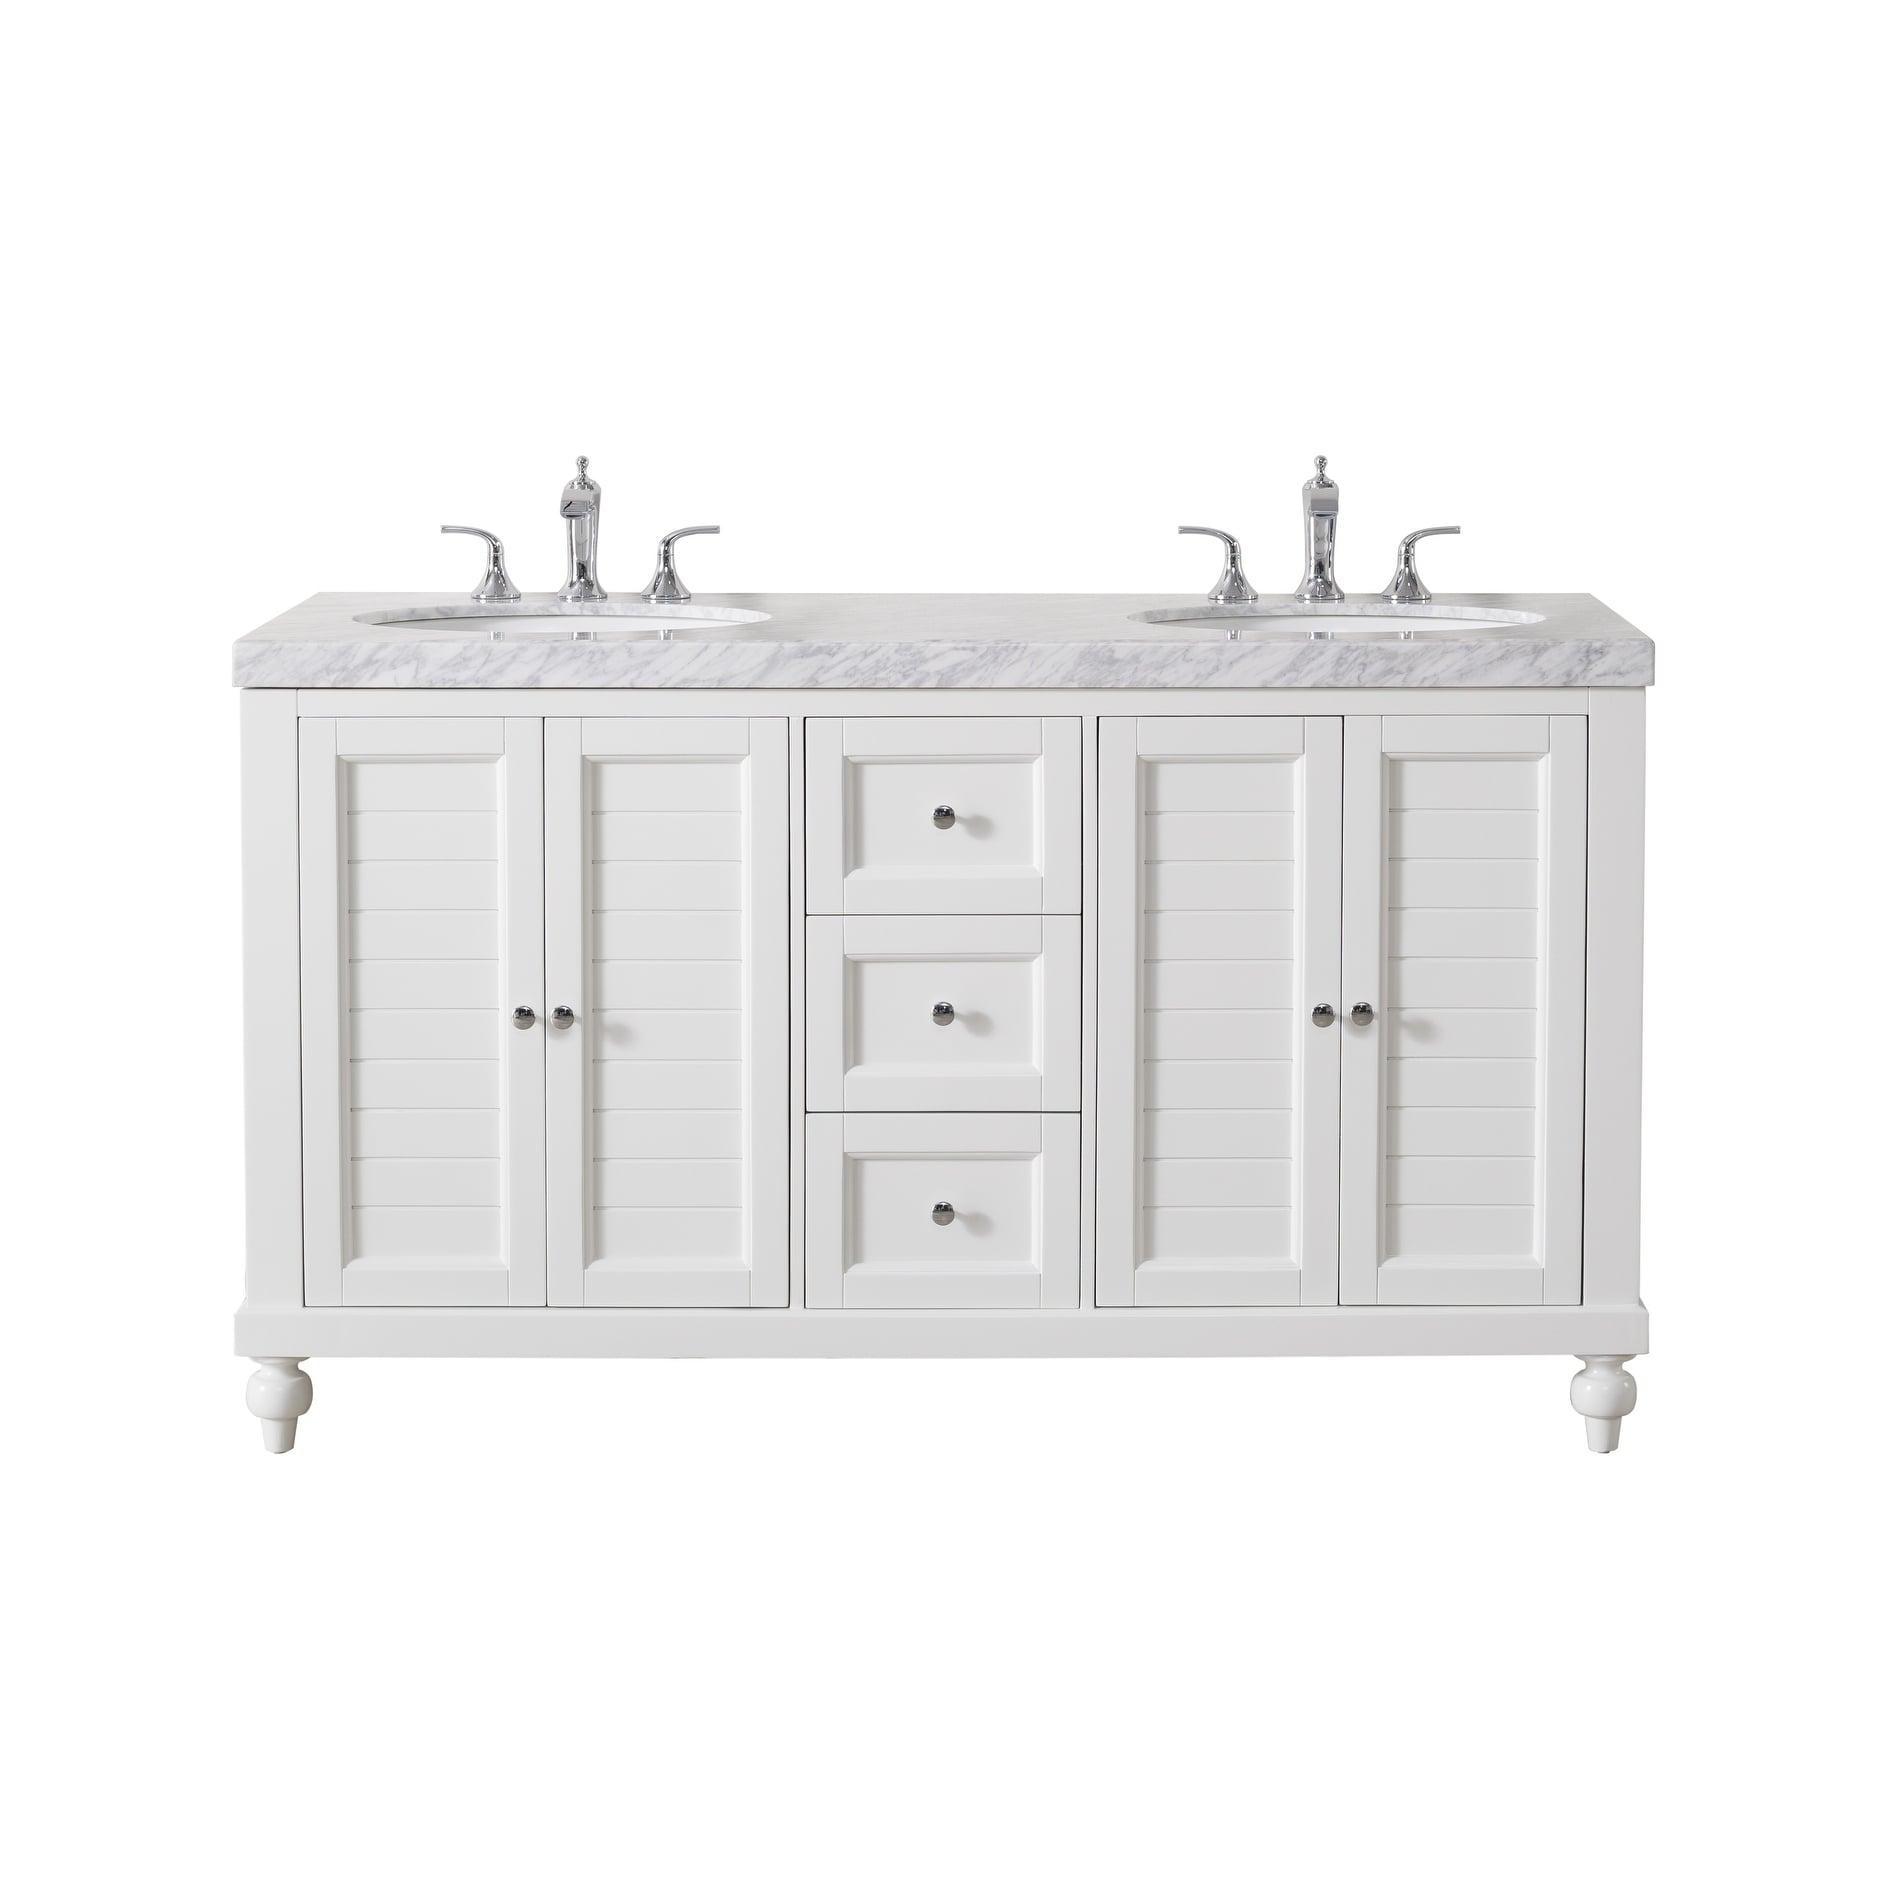 Image of: Shop Black Friday Deals On Stufurhome Kent 60 Inch White Double Sink Bathroom Vanity Overstock 22484935